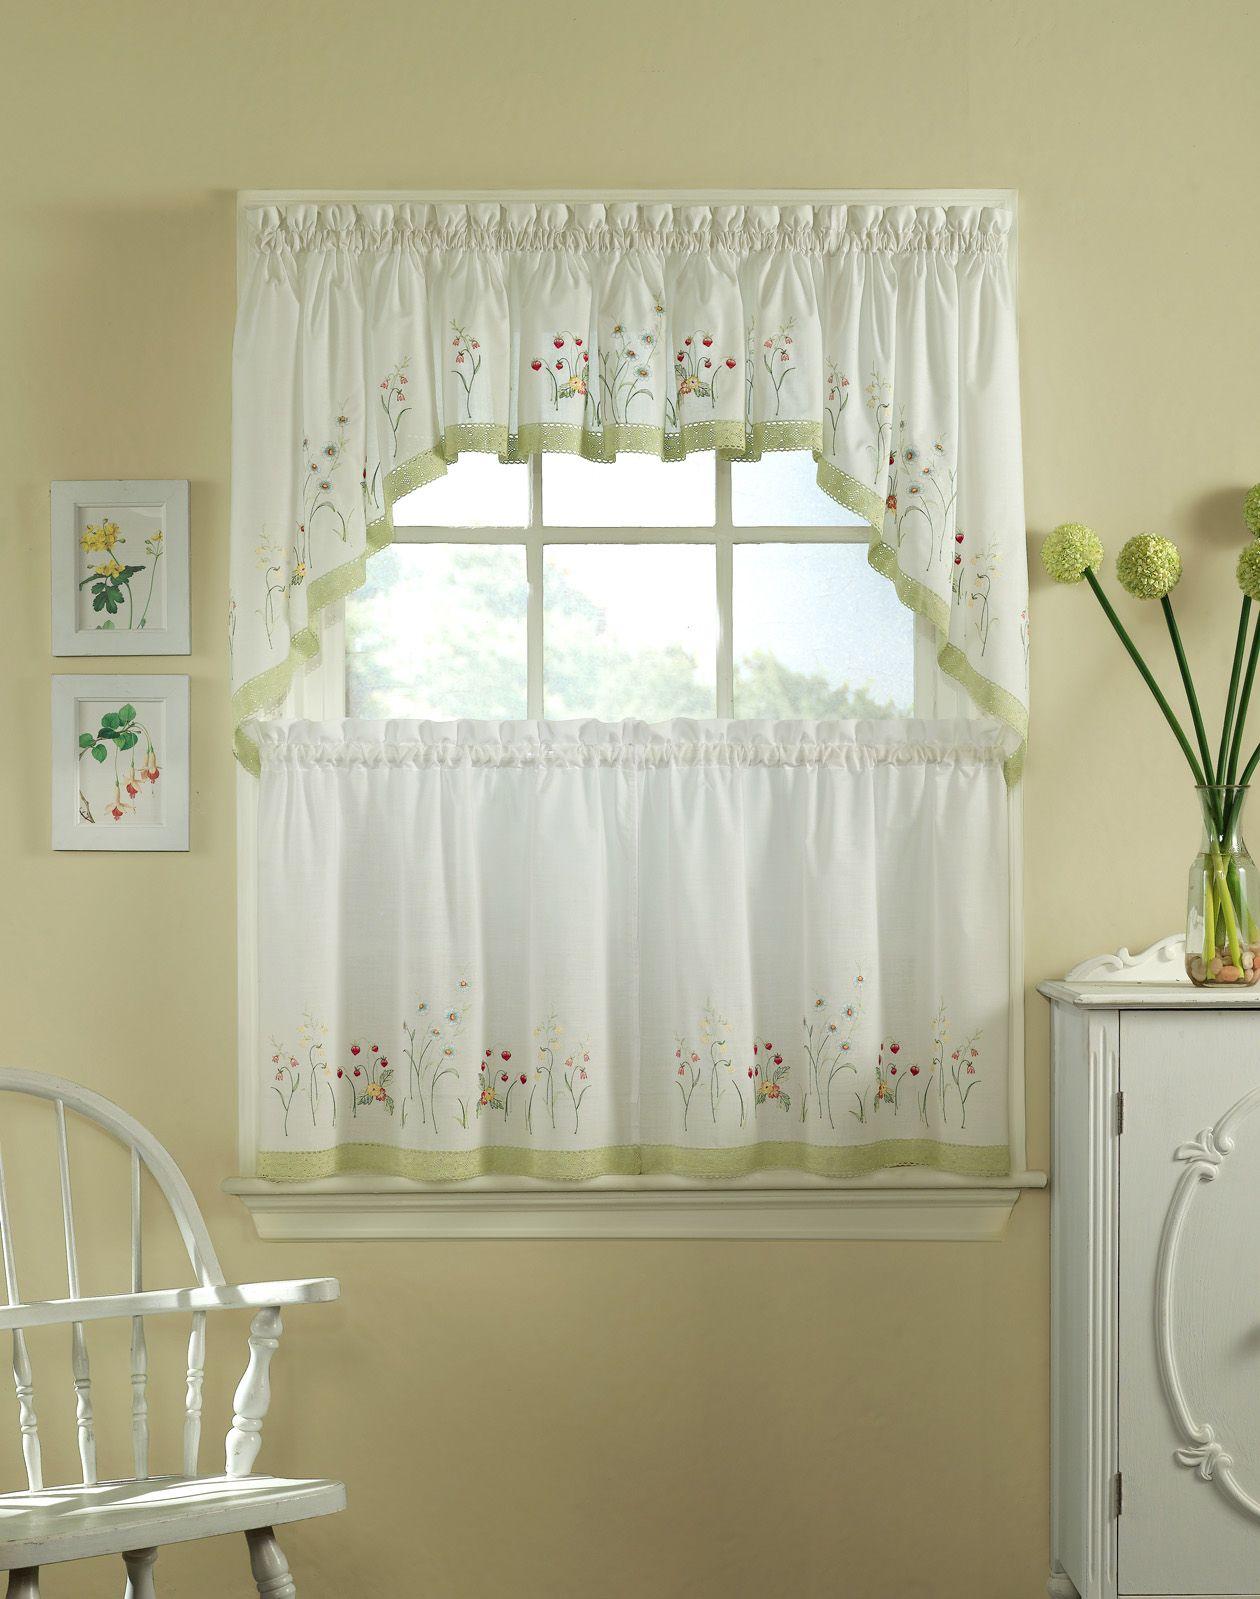 Half Window Curtains Ideas | Pinterest | Half window curtains ...